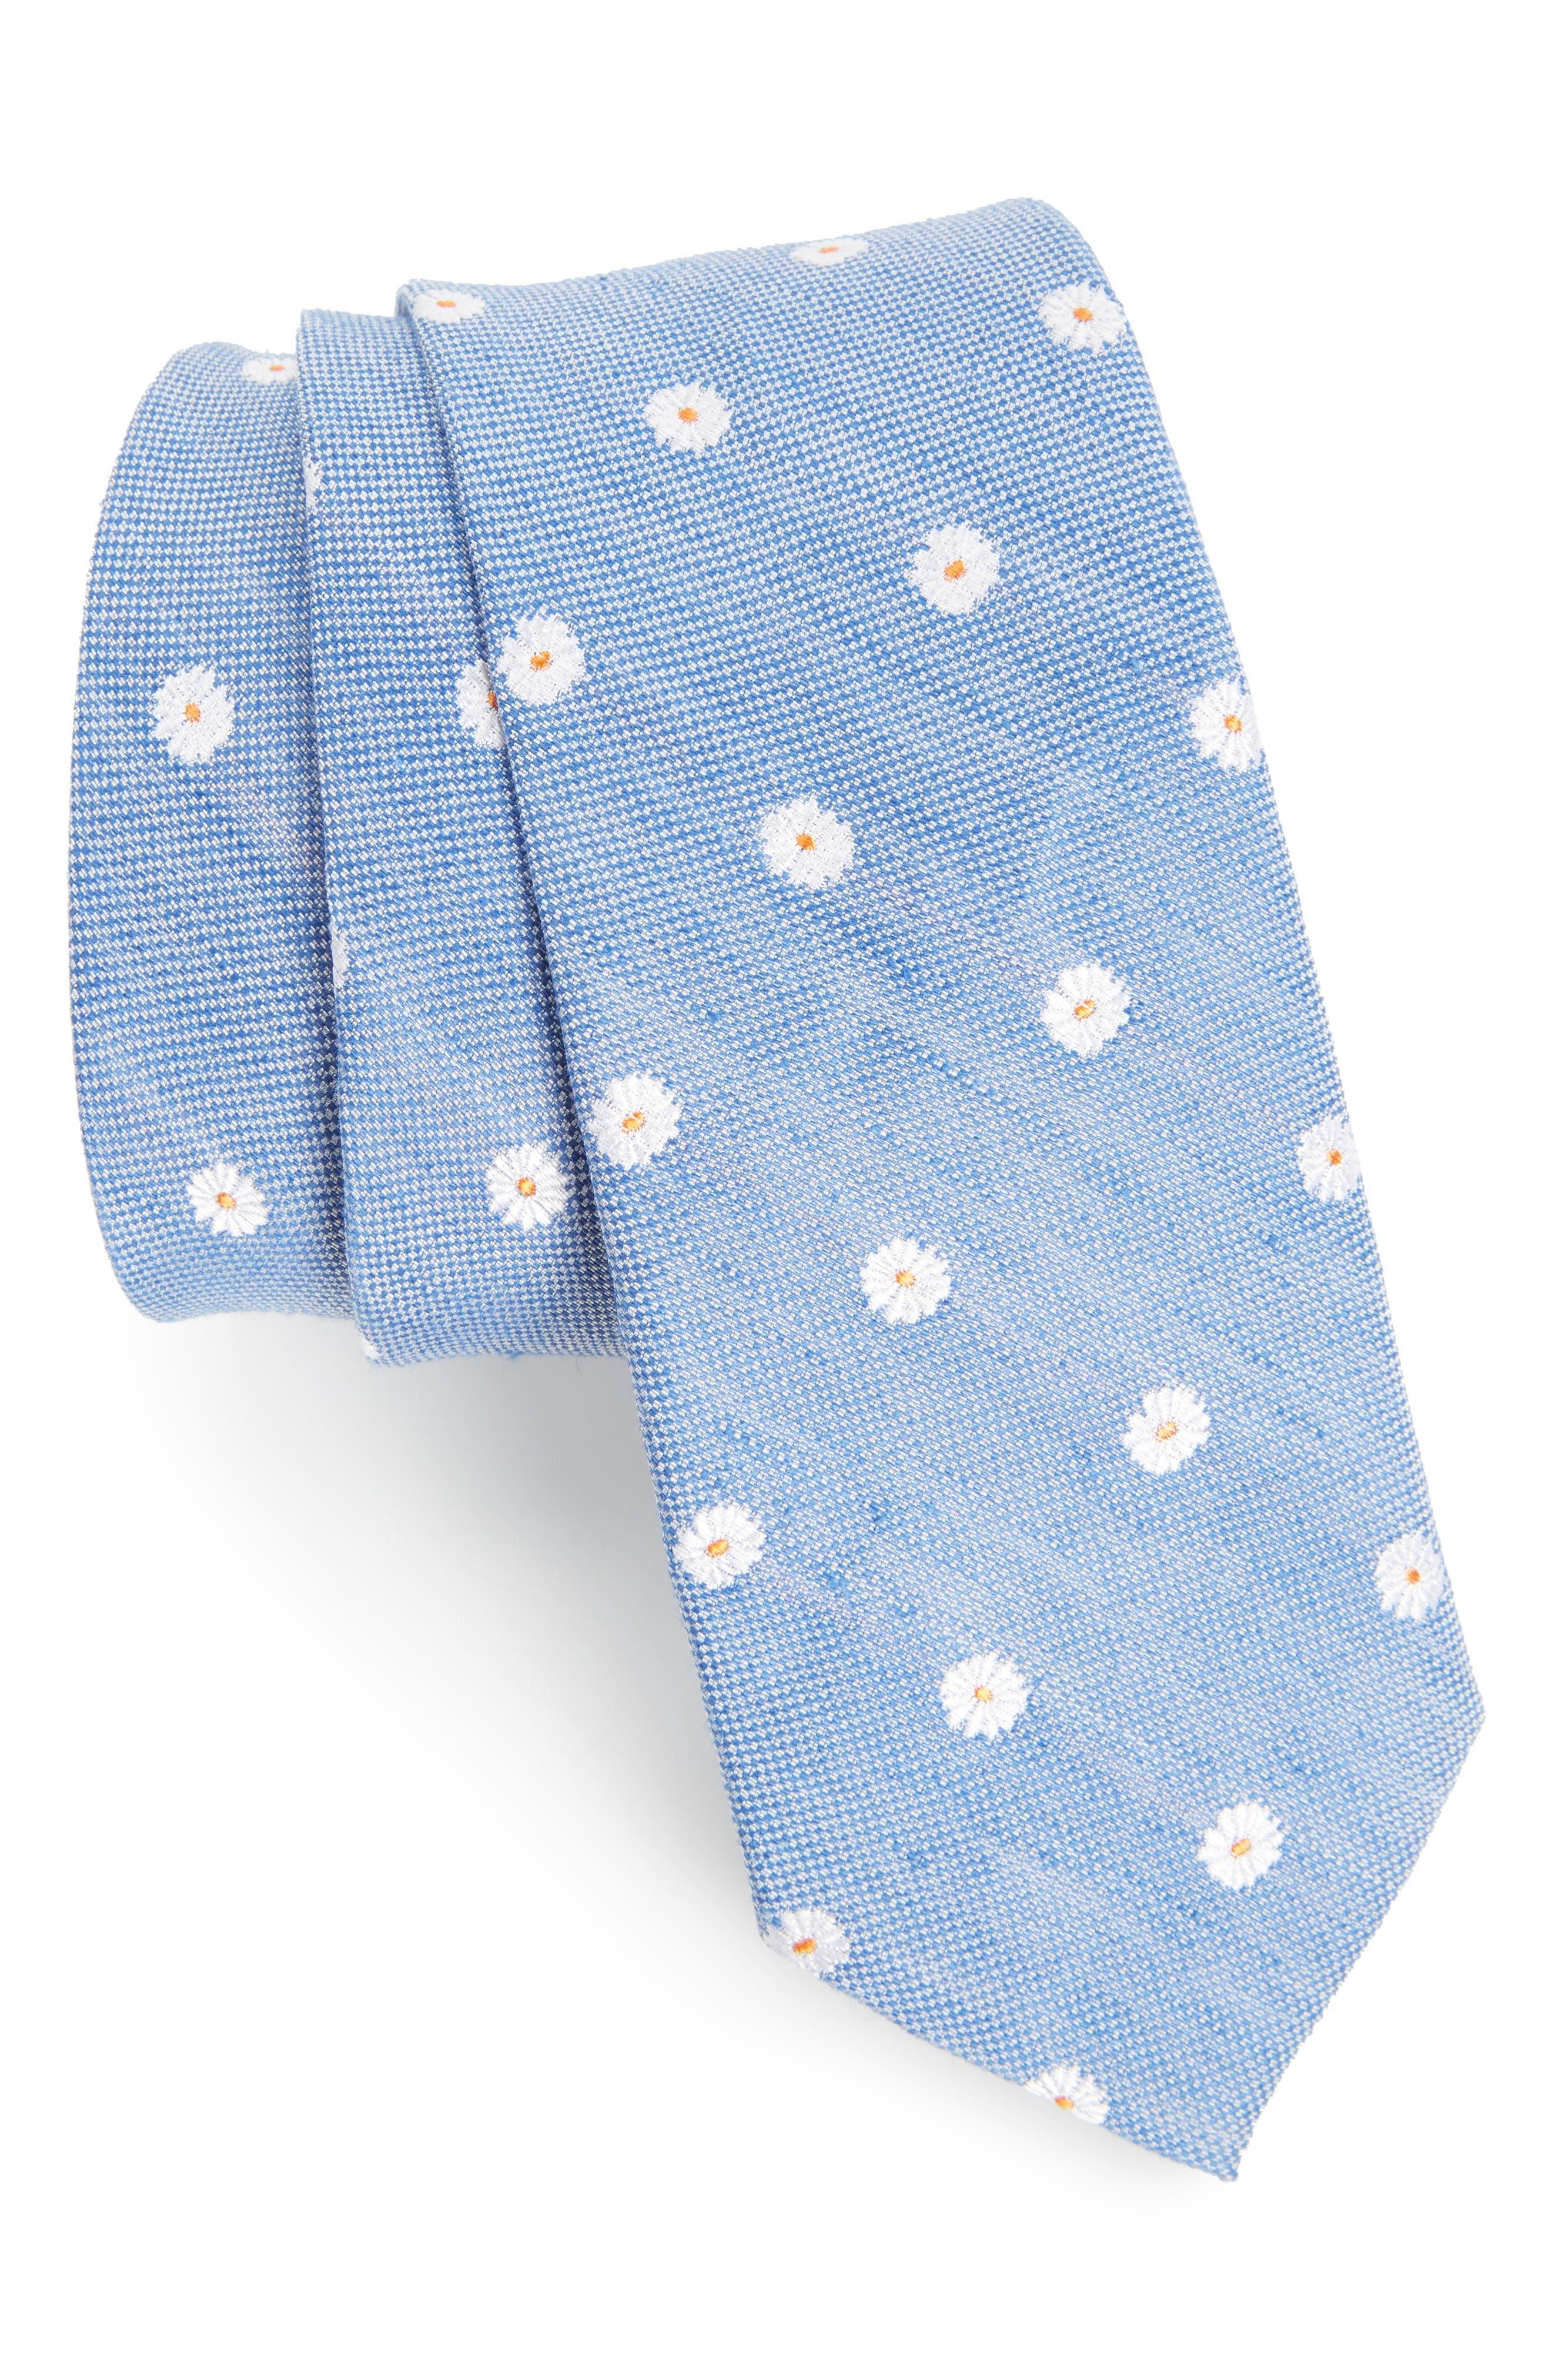 Hogard Floral Linen & Silk Skinny Tie,                             Main thumbnail 1, color,                             Blue